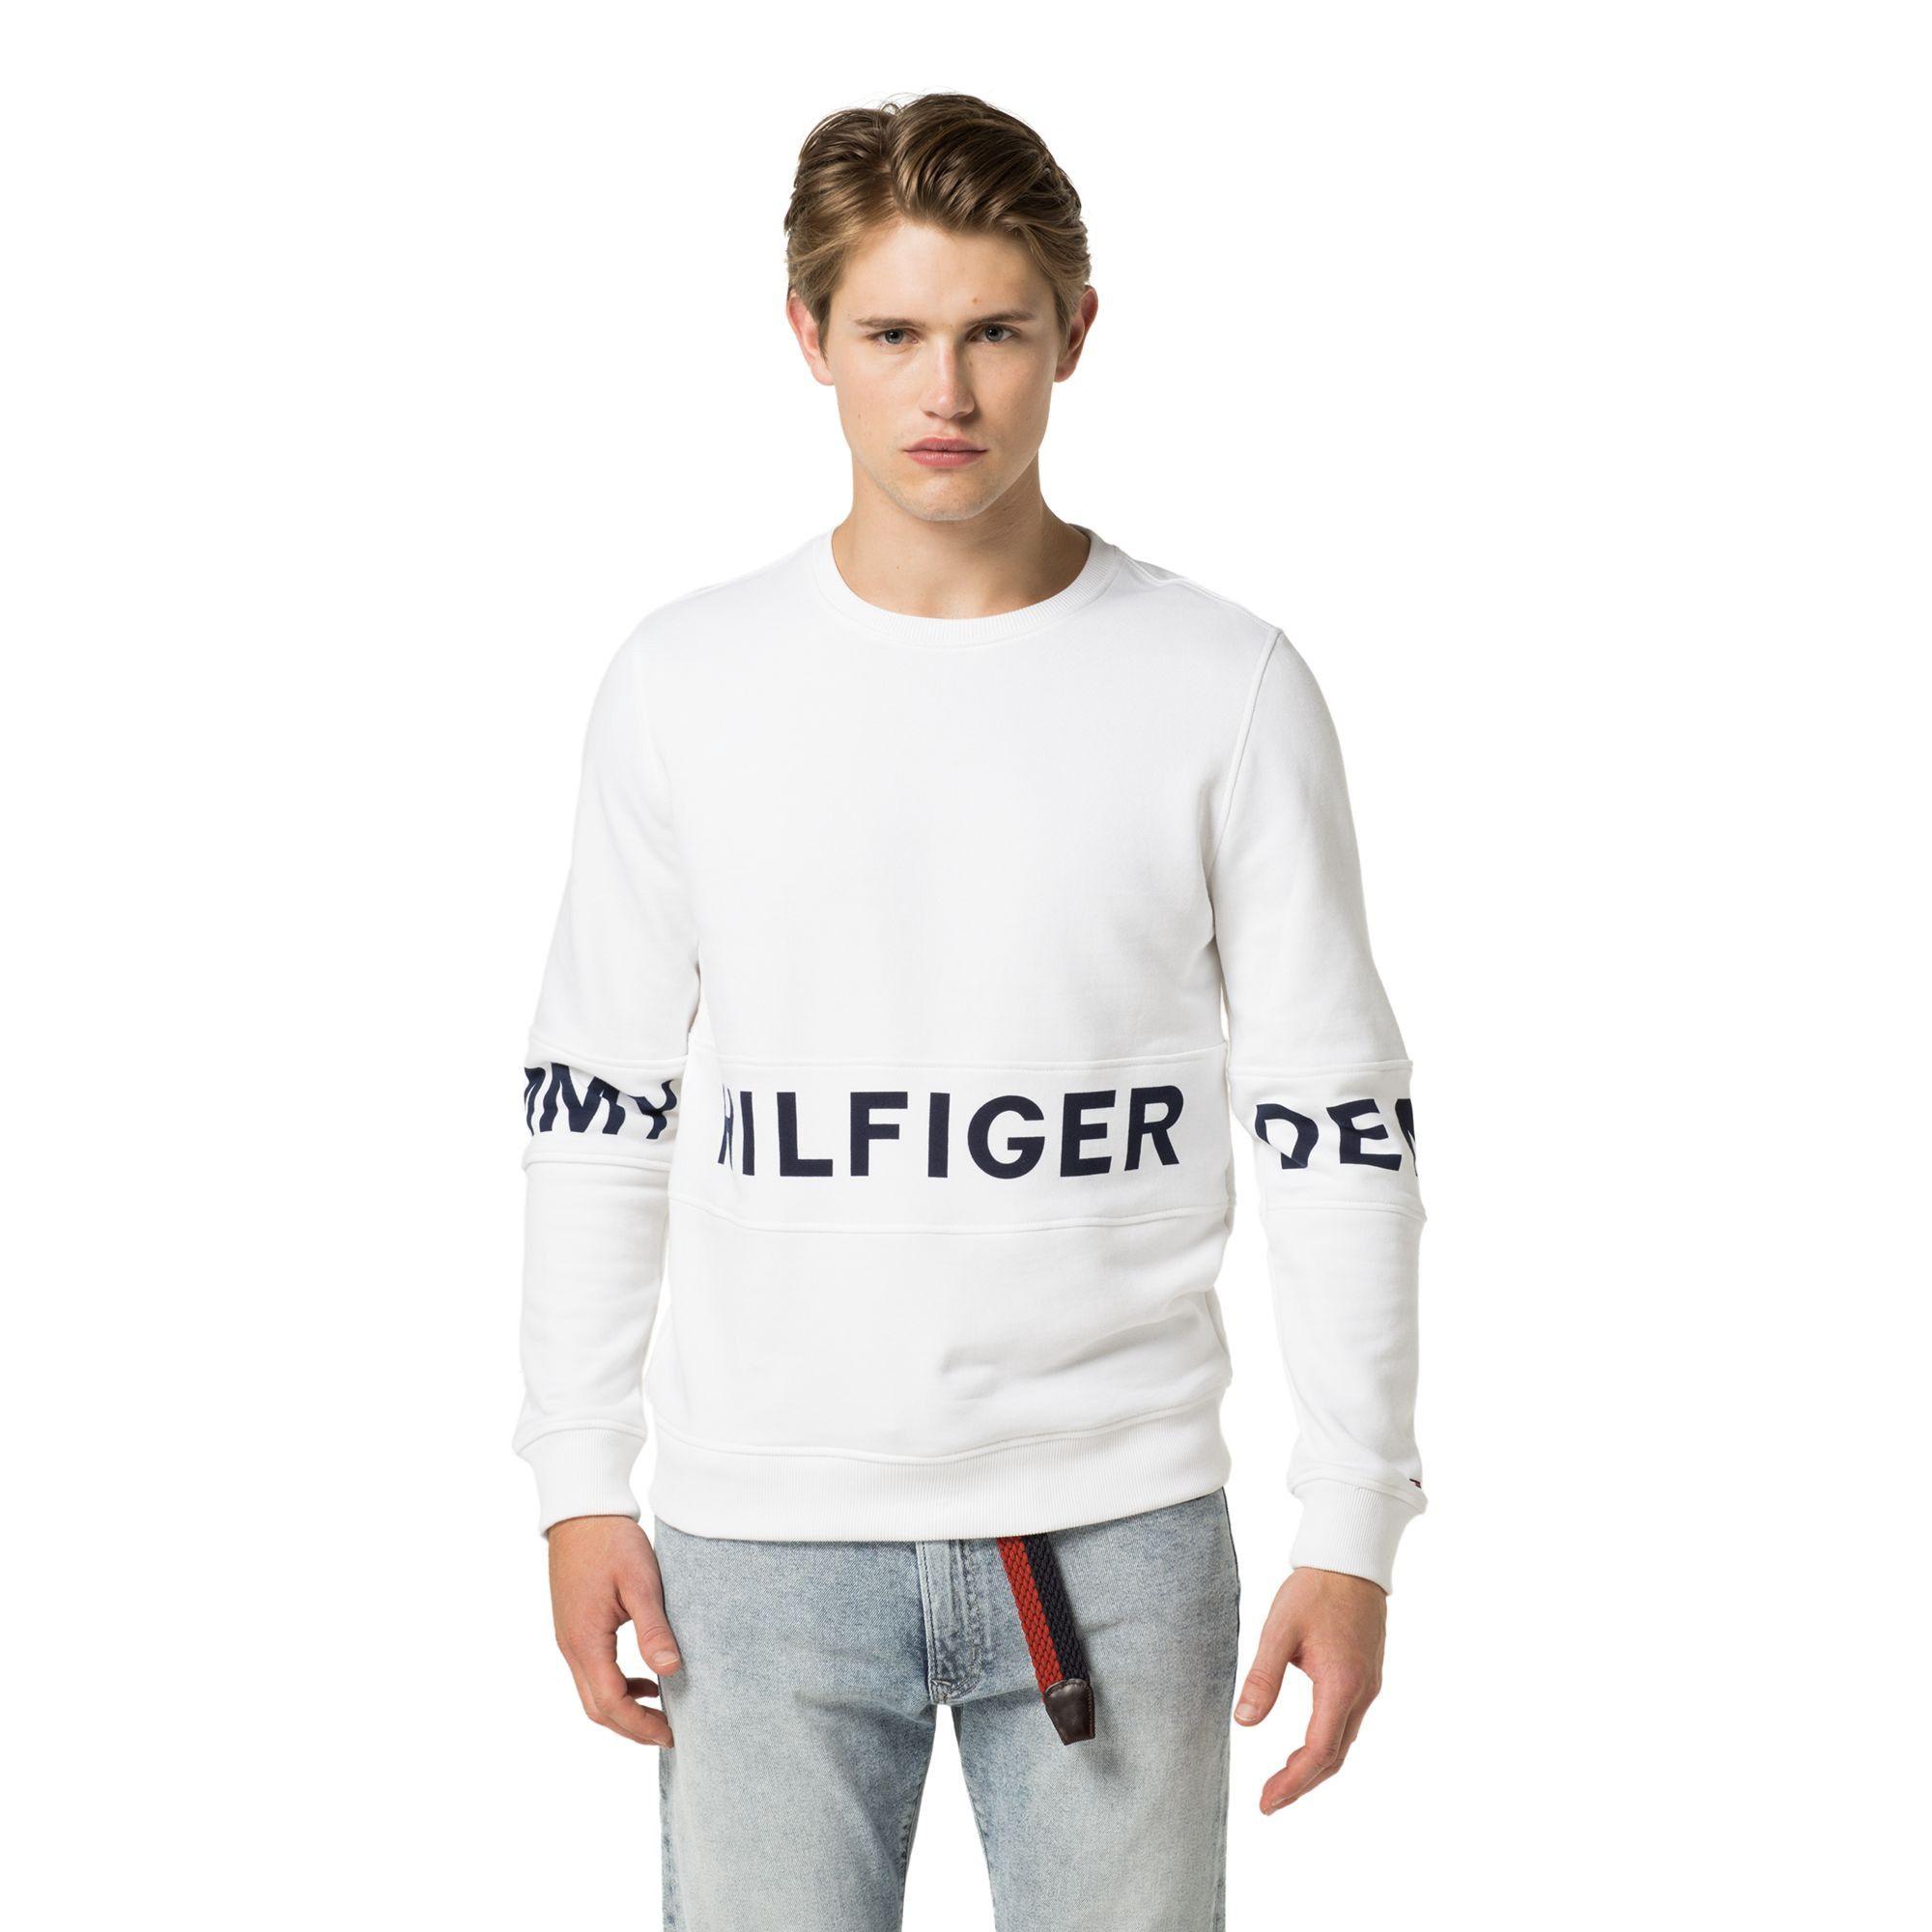 489caa457 TOMMY HILFIGER SIGNATURE CREWNECK SWEATSHIRT - CLASSIC WHITE.  tommyhilfiger   cloth